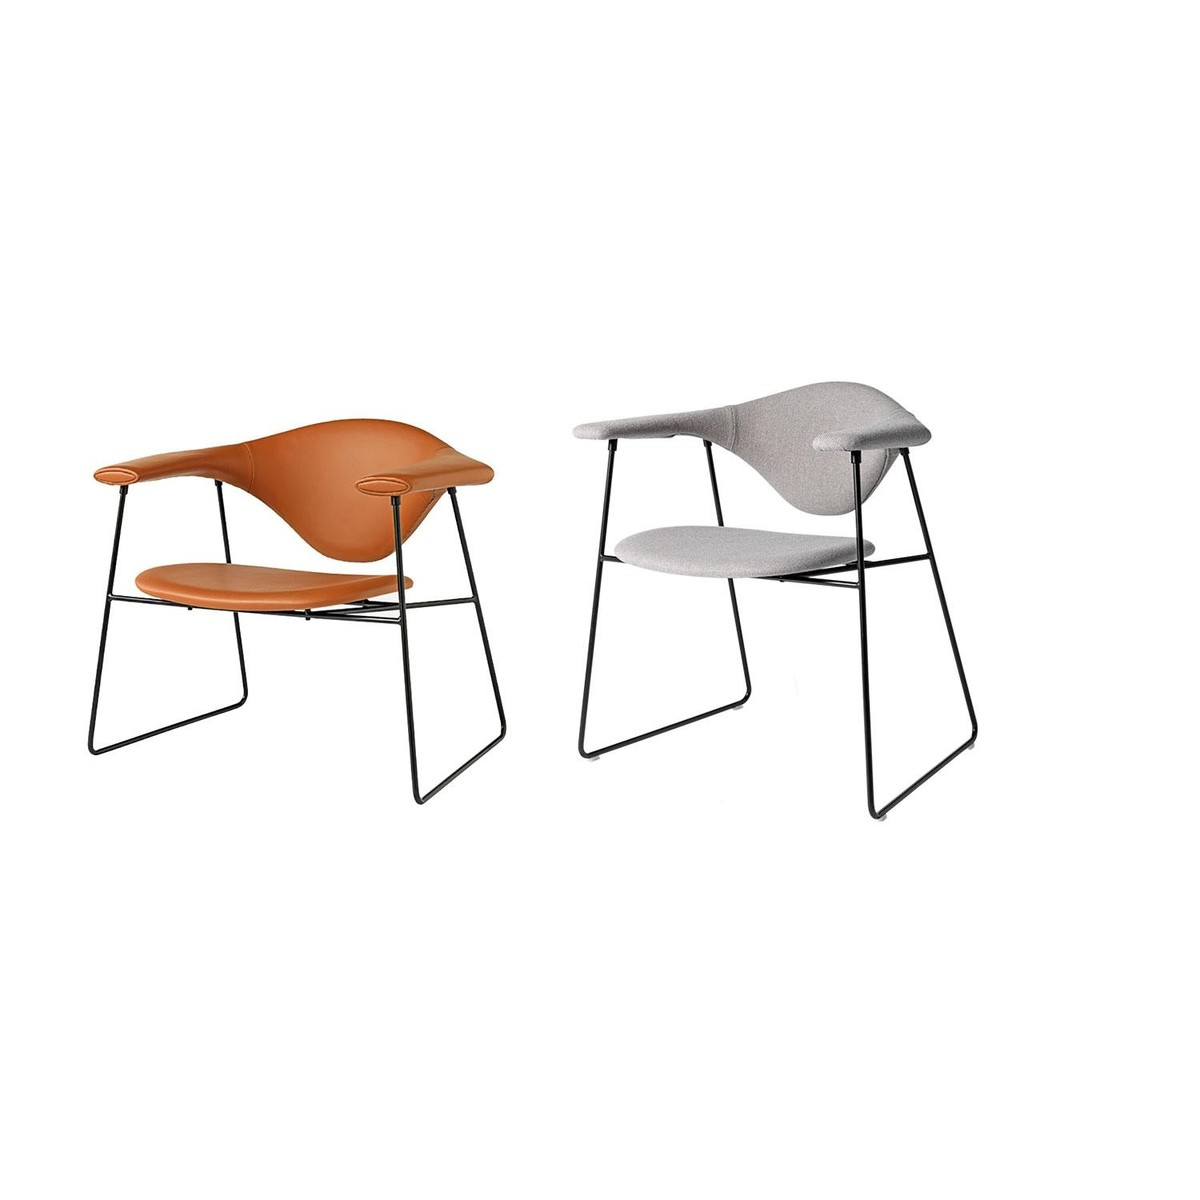 Gubi Masculo Lounge Chair Gubi AmbienteDirectcom : none1200x1200 ID553736 c89b1de4cfe2d6d5a6f64ac78083a06c from www.ambientedirect.com size 1200 x 1200 jpeg 56kB